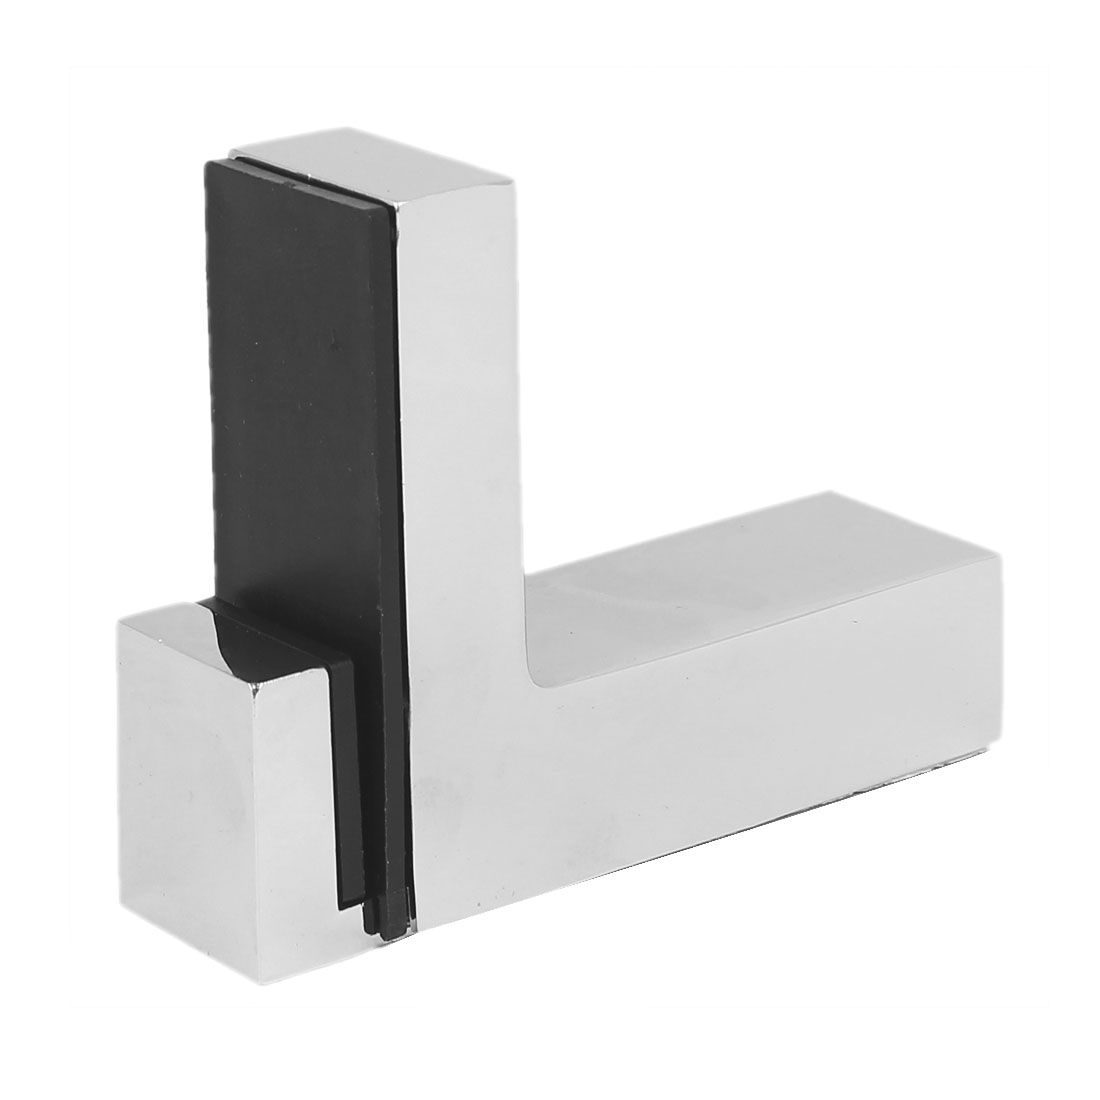 Wall Cabinet Metal Adjustable Glass Clip Shelf Clamp Support Bracket Holder - image 6 of 6